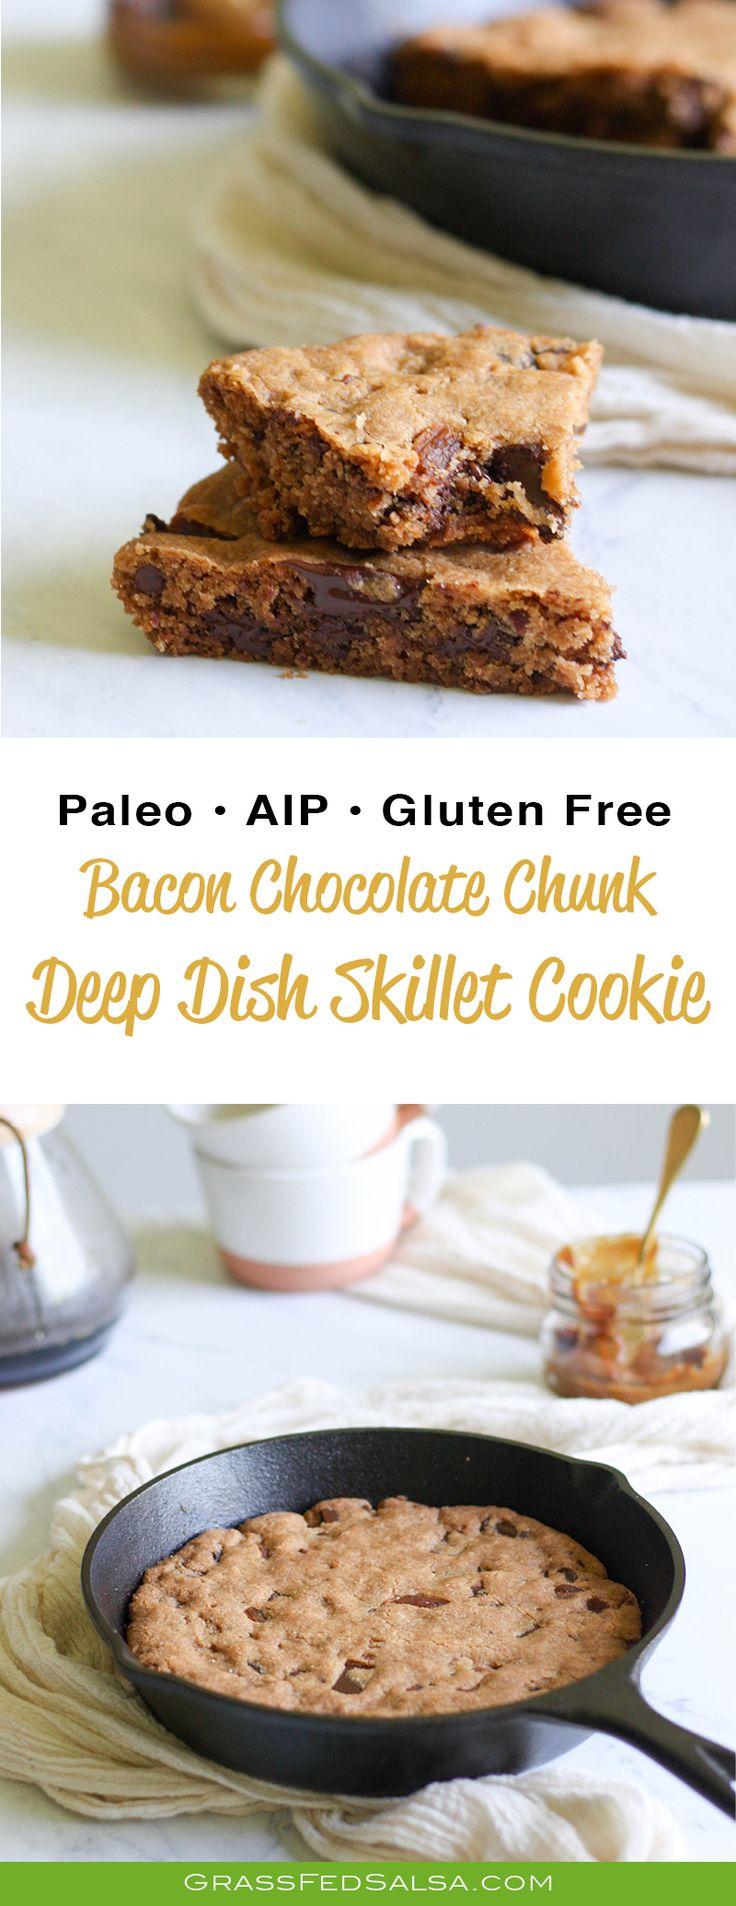 Bacon Chocolate Chunk Deep Dish Skillet Cookie recipe (Paleo, AIP, Gluten Free)